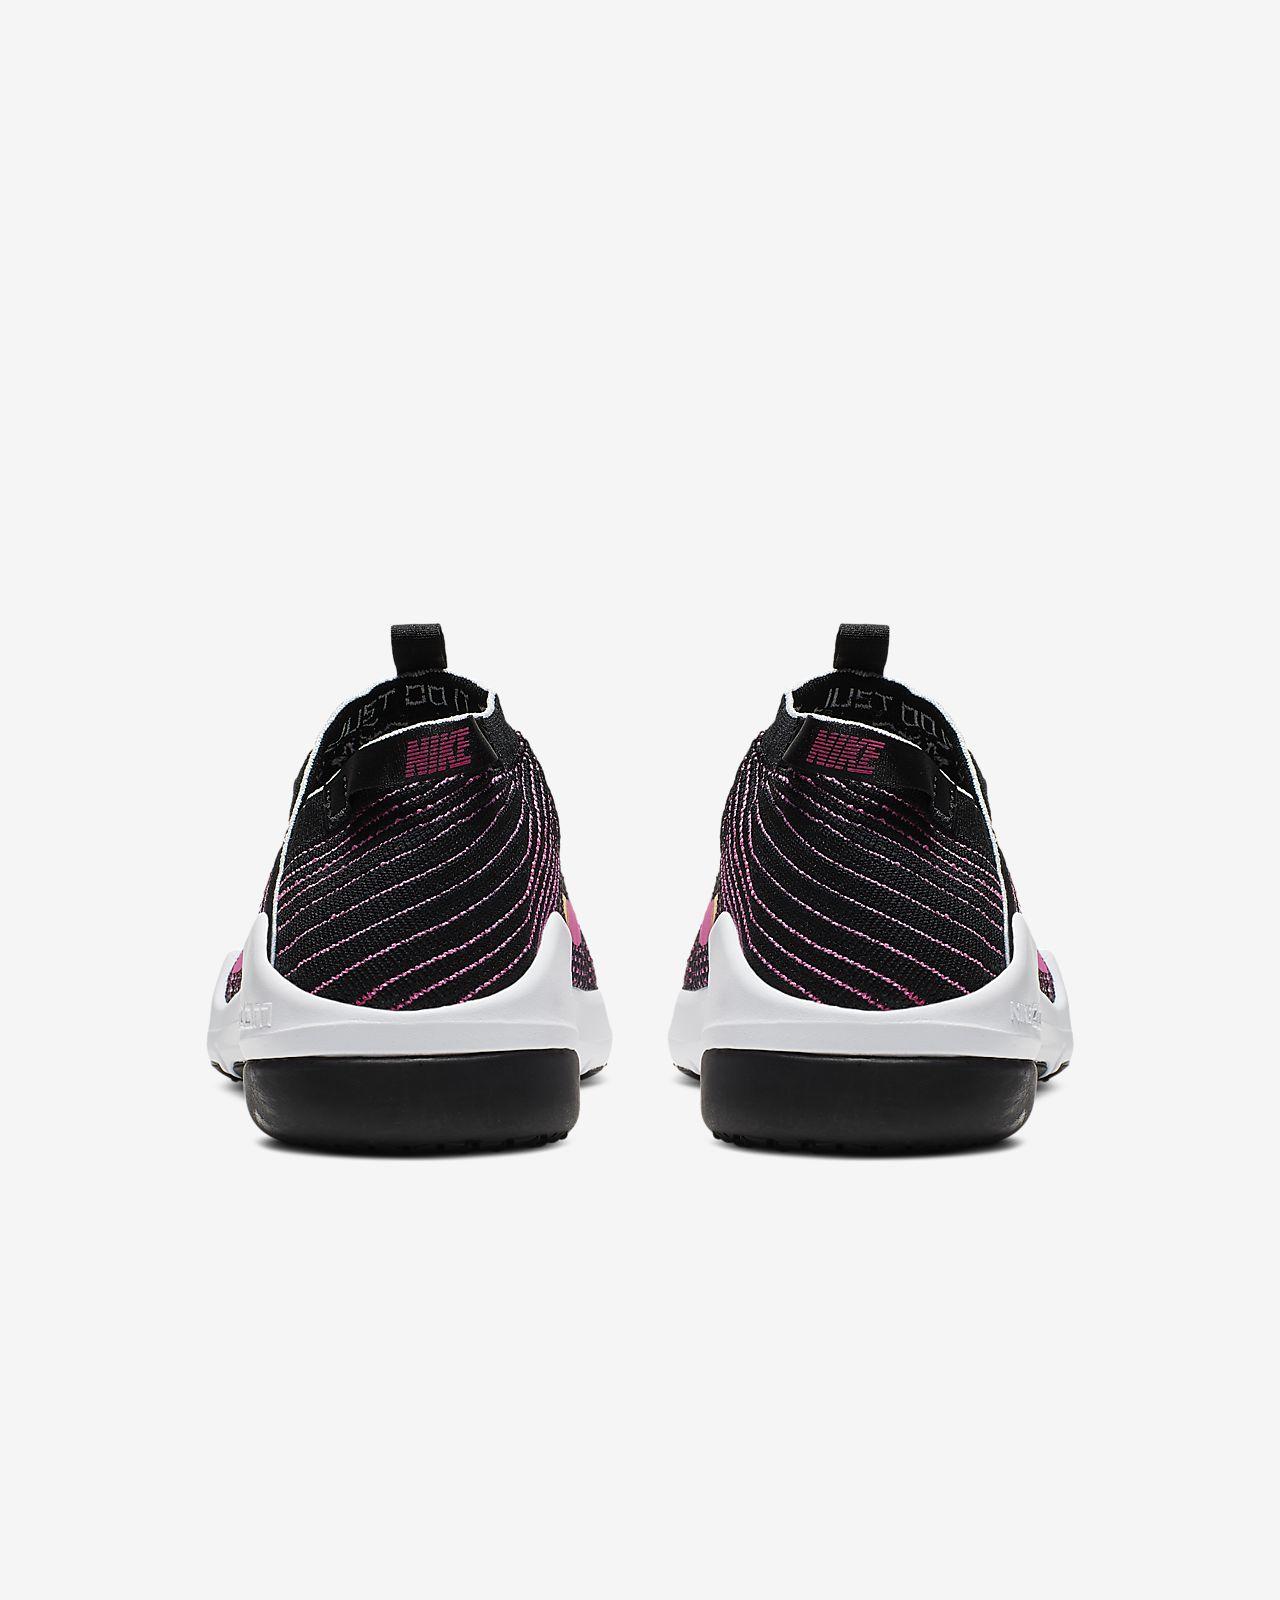 online retailer 264bf 0747e ... Nike Air Zoom Fearless Flyknit 2 Women s Gym Training Boxing Shoe